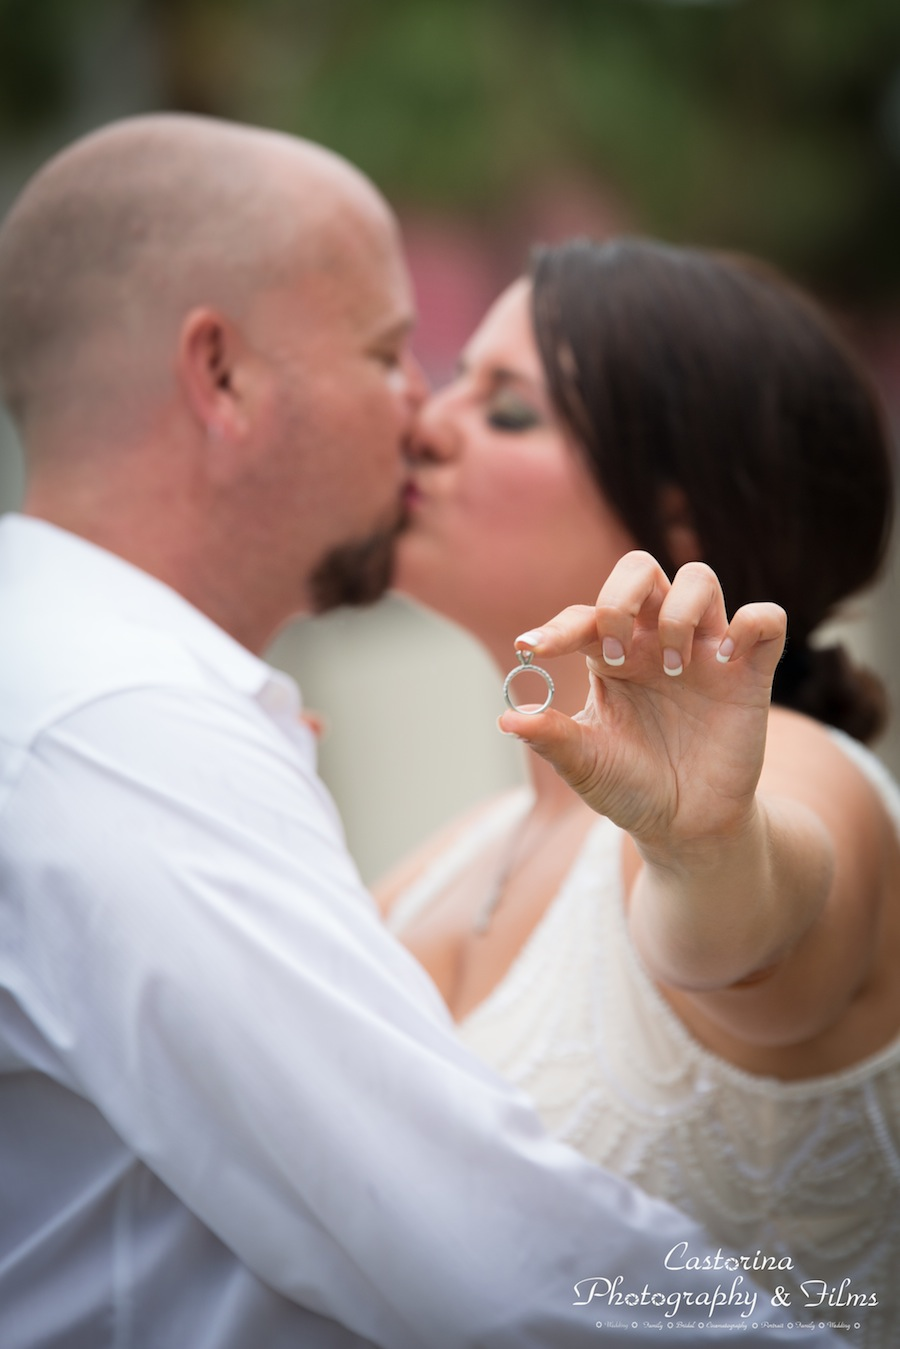 Tampa Bay Buccaneers Engagement Session at Raymond James Stadium | Tampa Wedding Photographer Castorina Photography